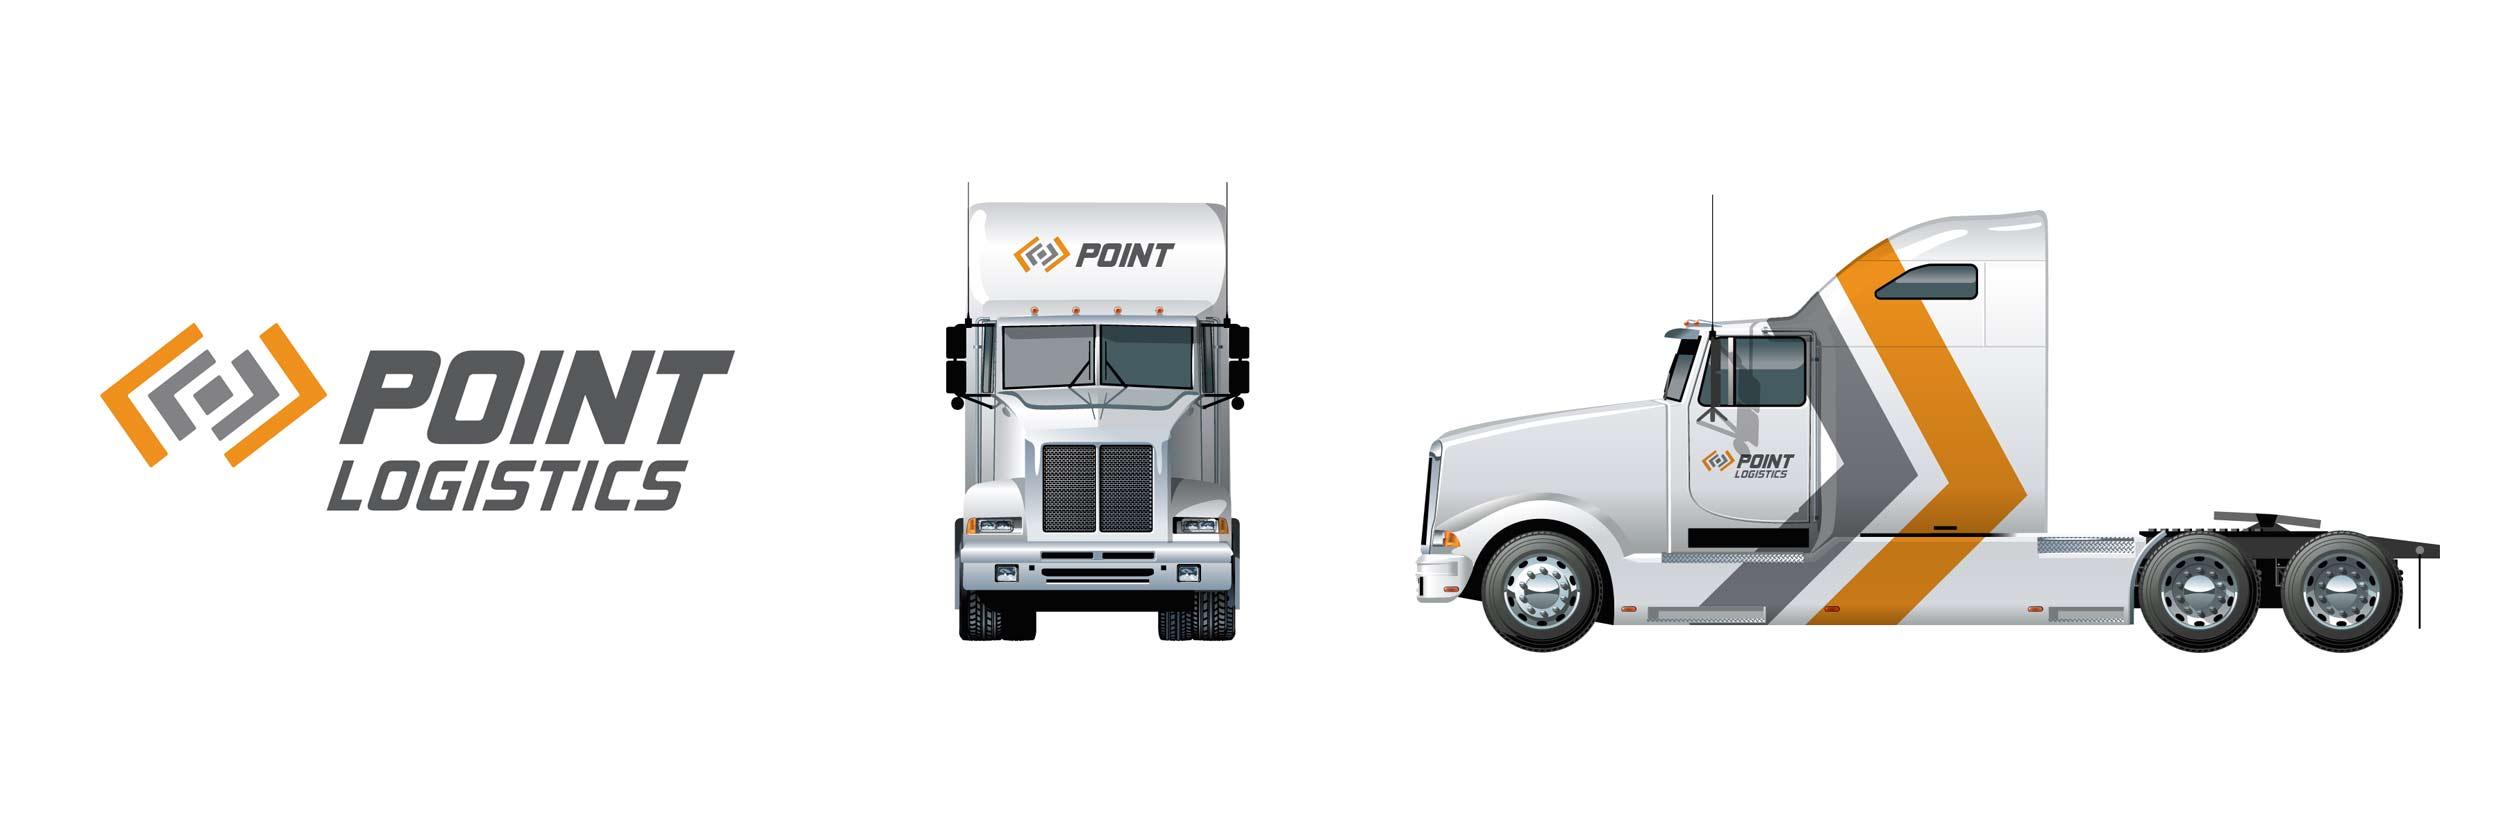 Point Logistics